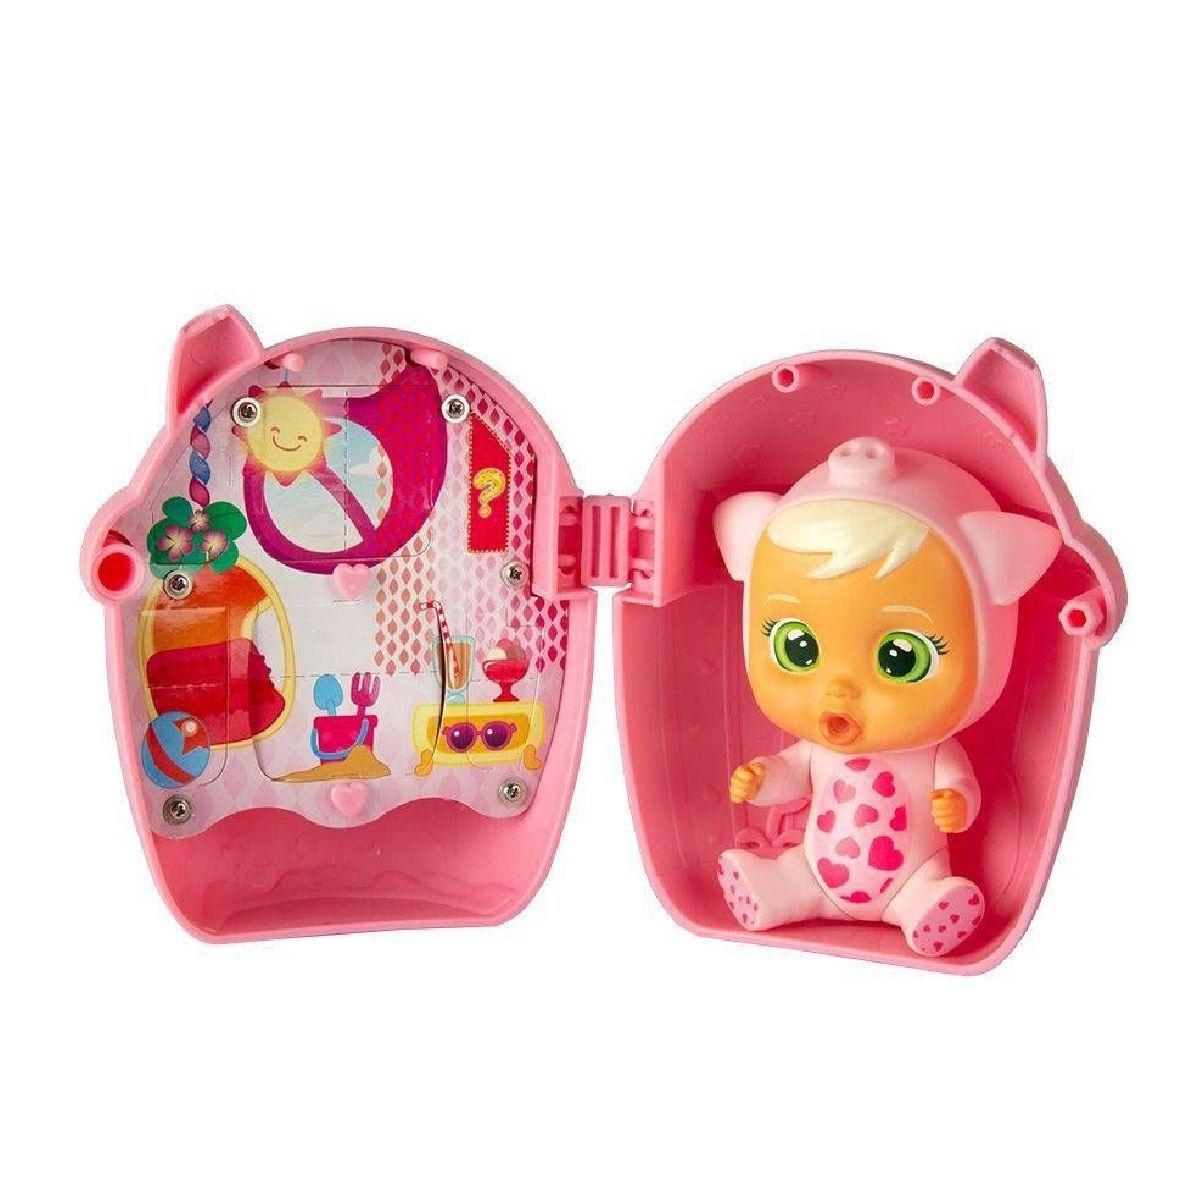 Mini Bonecas Cry Babies Magic Tears Bottle House - BR980 - Multikids